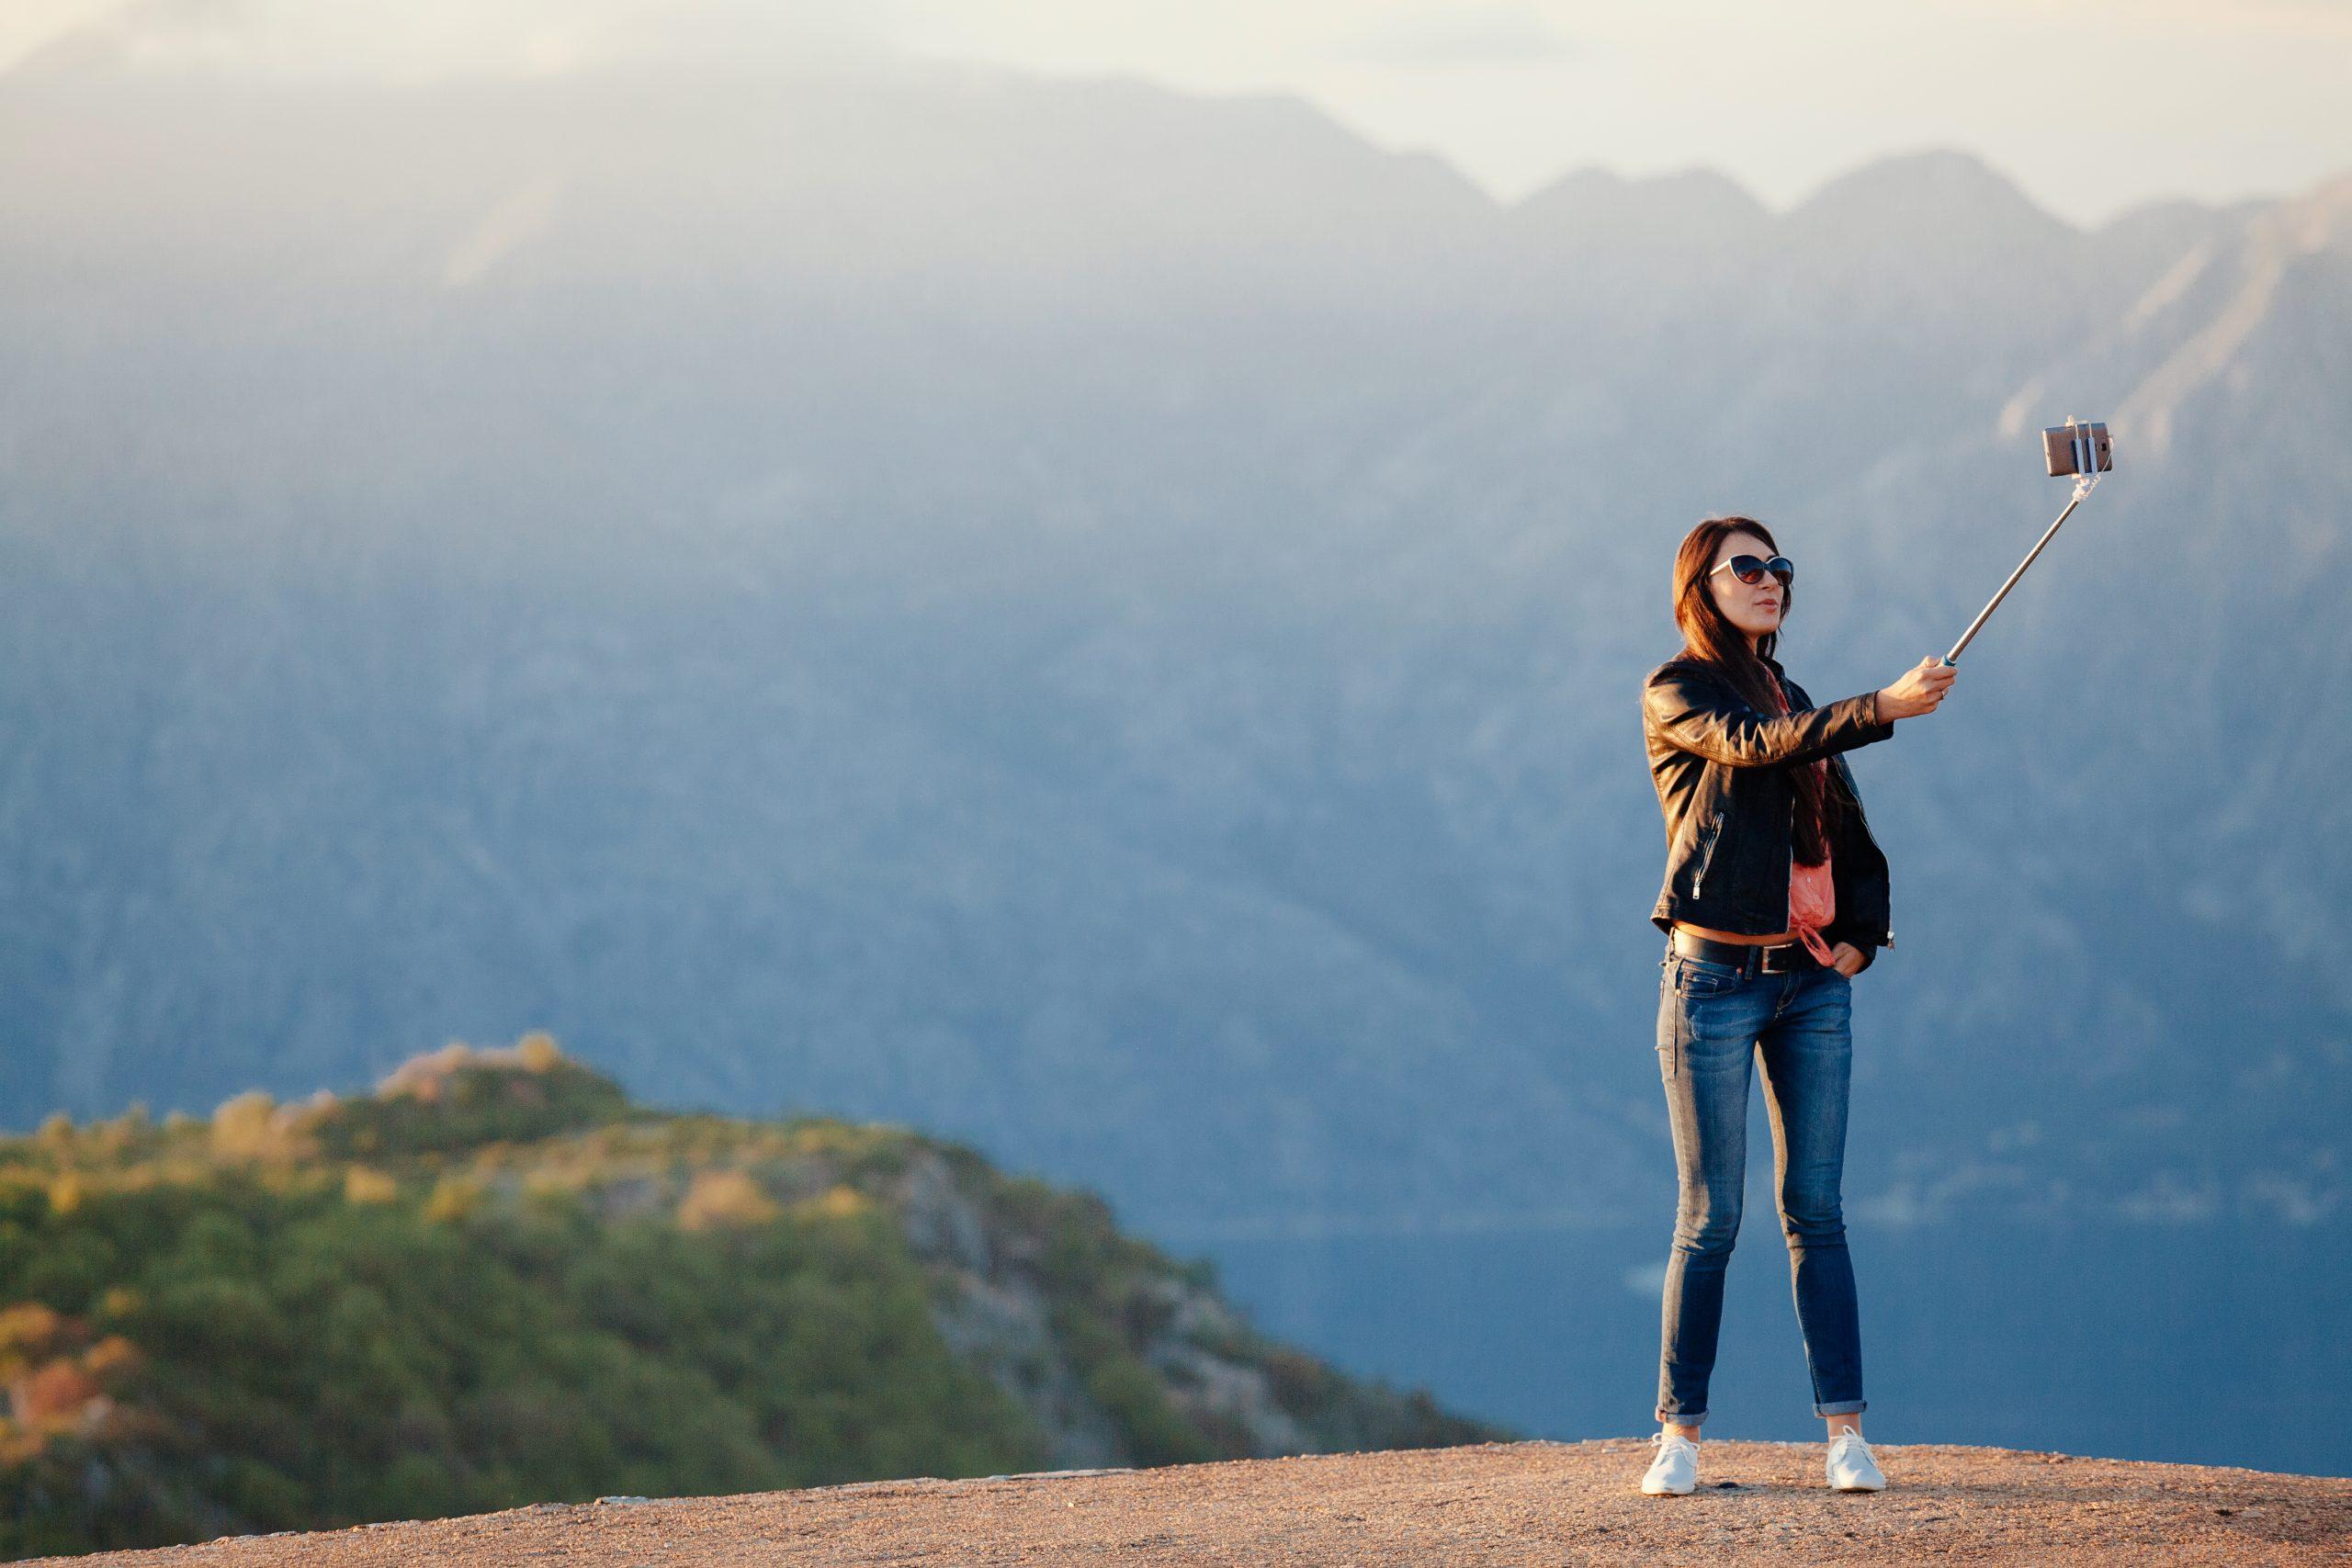 joyful woman travel and photo selfie 9XPYXUH 1 scaled